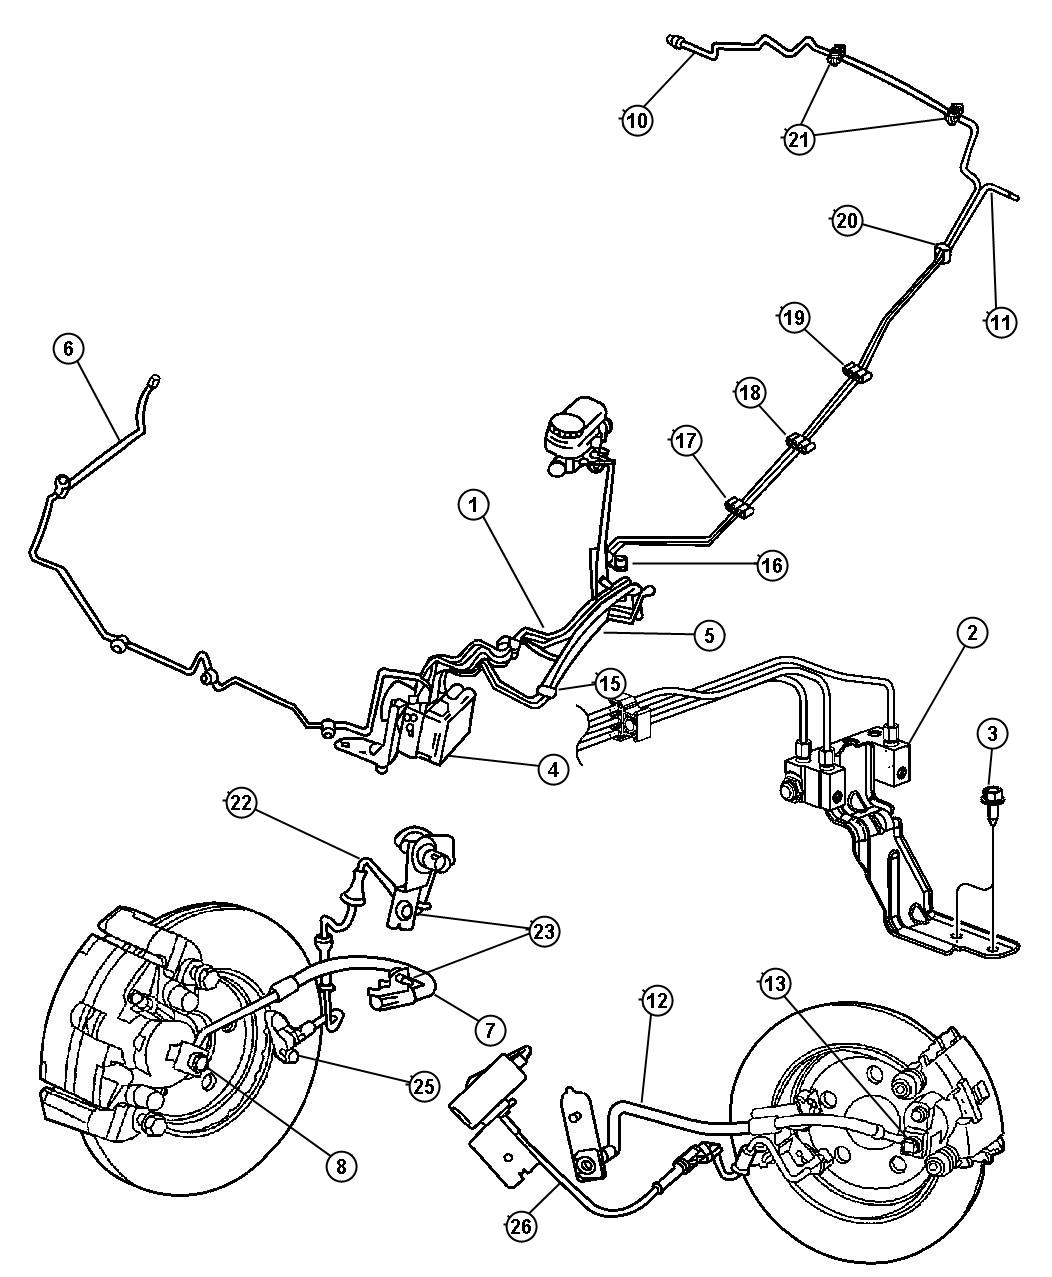 I on 2004 Sebring Rear Brake Diagram